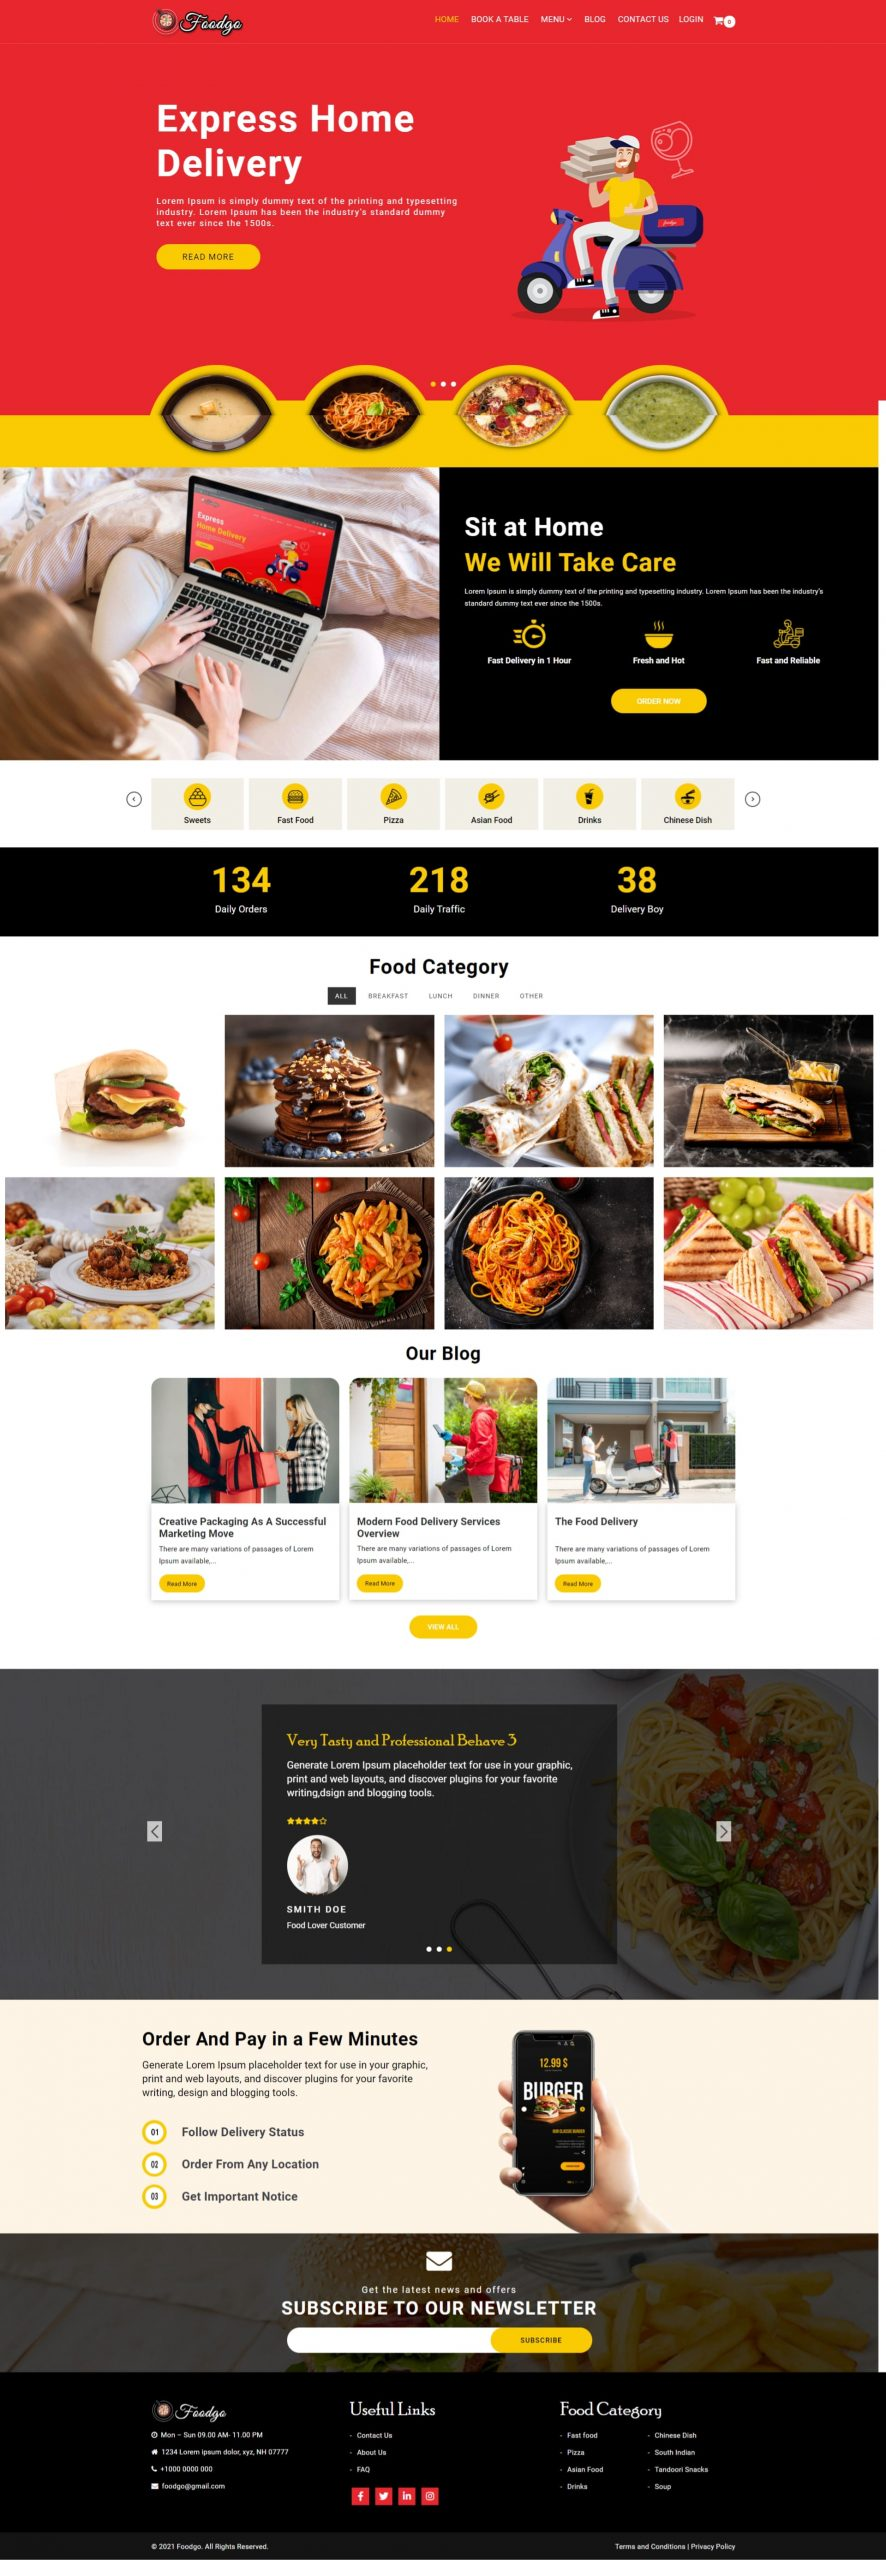 FoodGo – Modern Food Delivery and Restaurant WordPress Theme - Bright Red Header Design